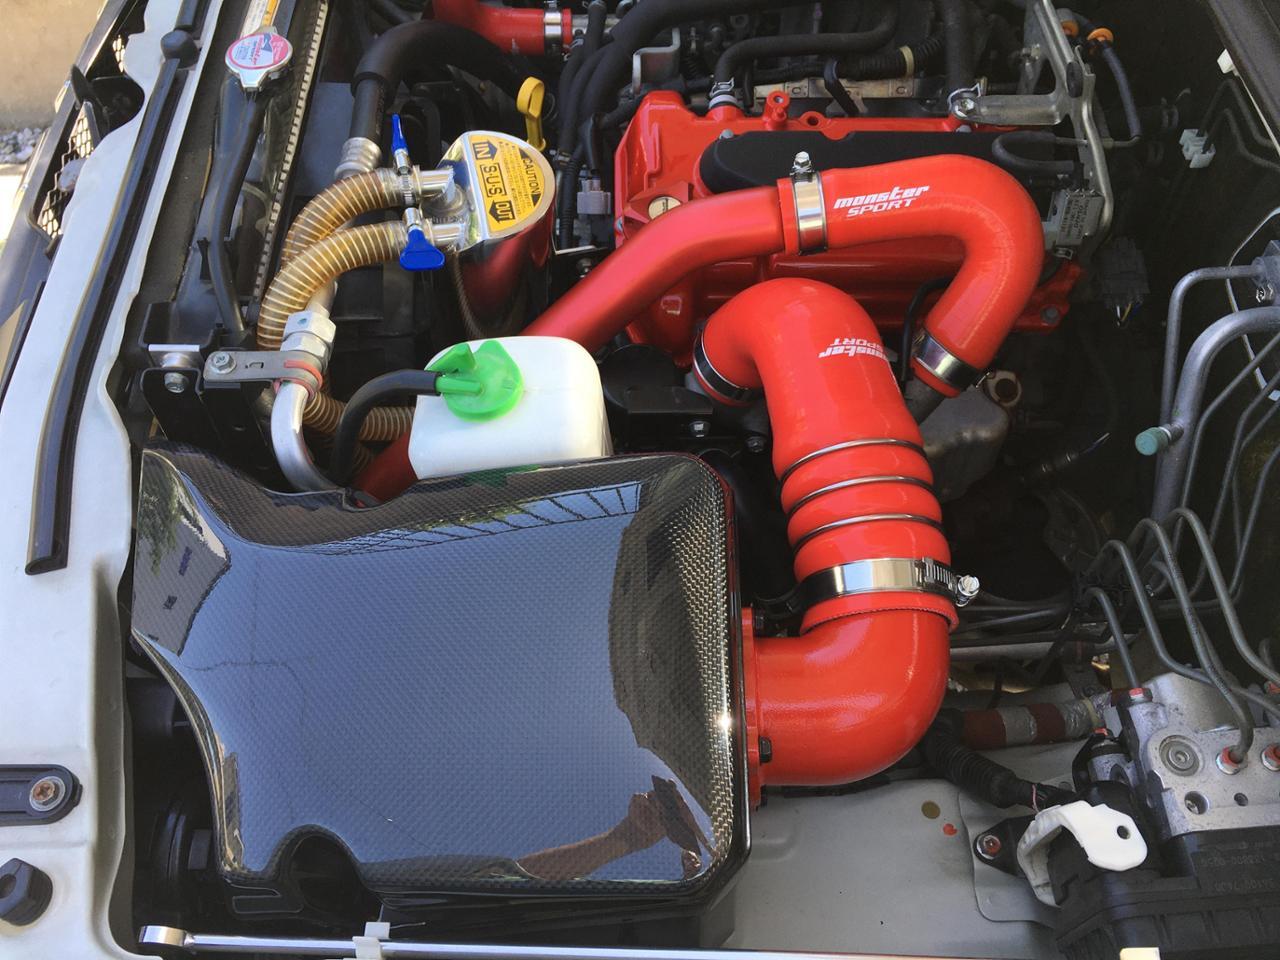 MONSTER SPORT / TAJIMA MOTOR CORPORATION PFX400 インテークキット